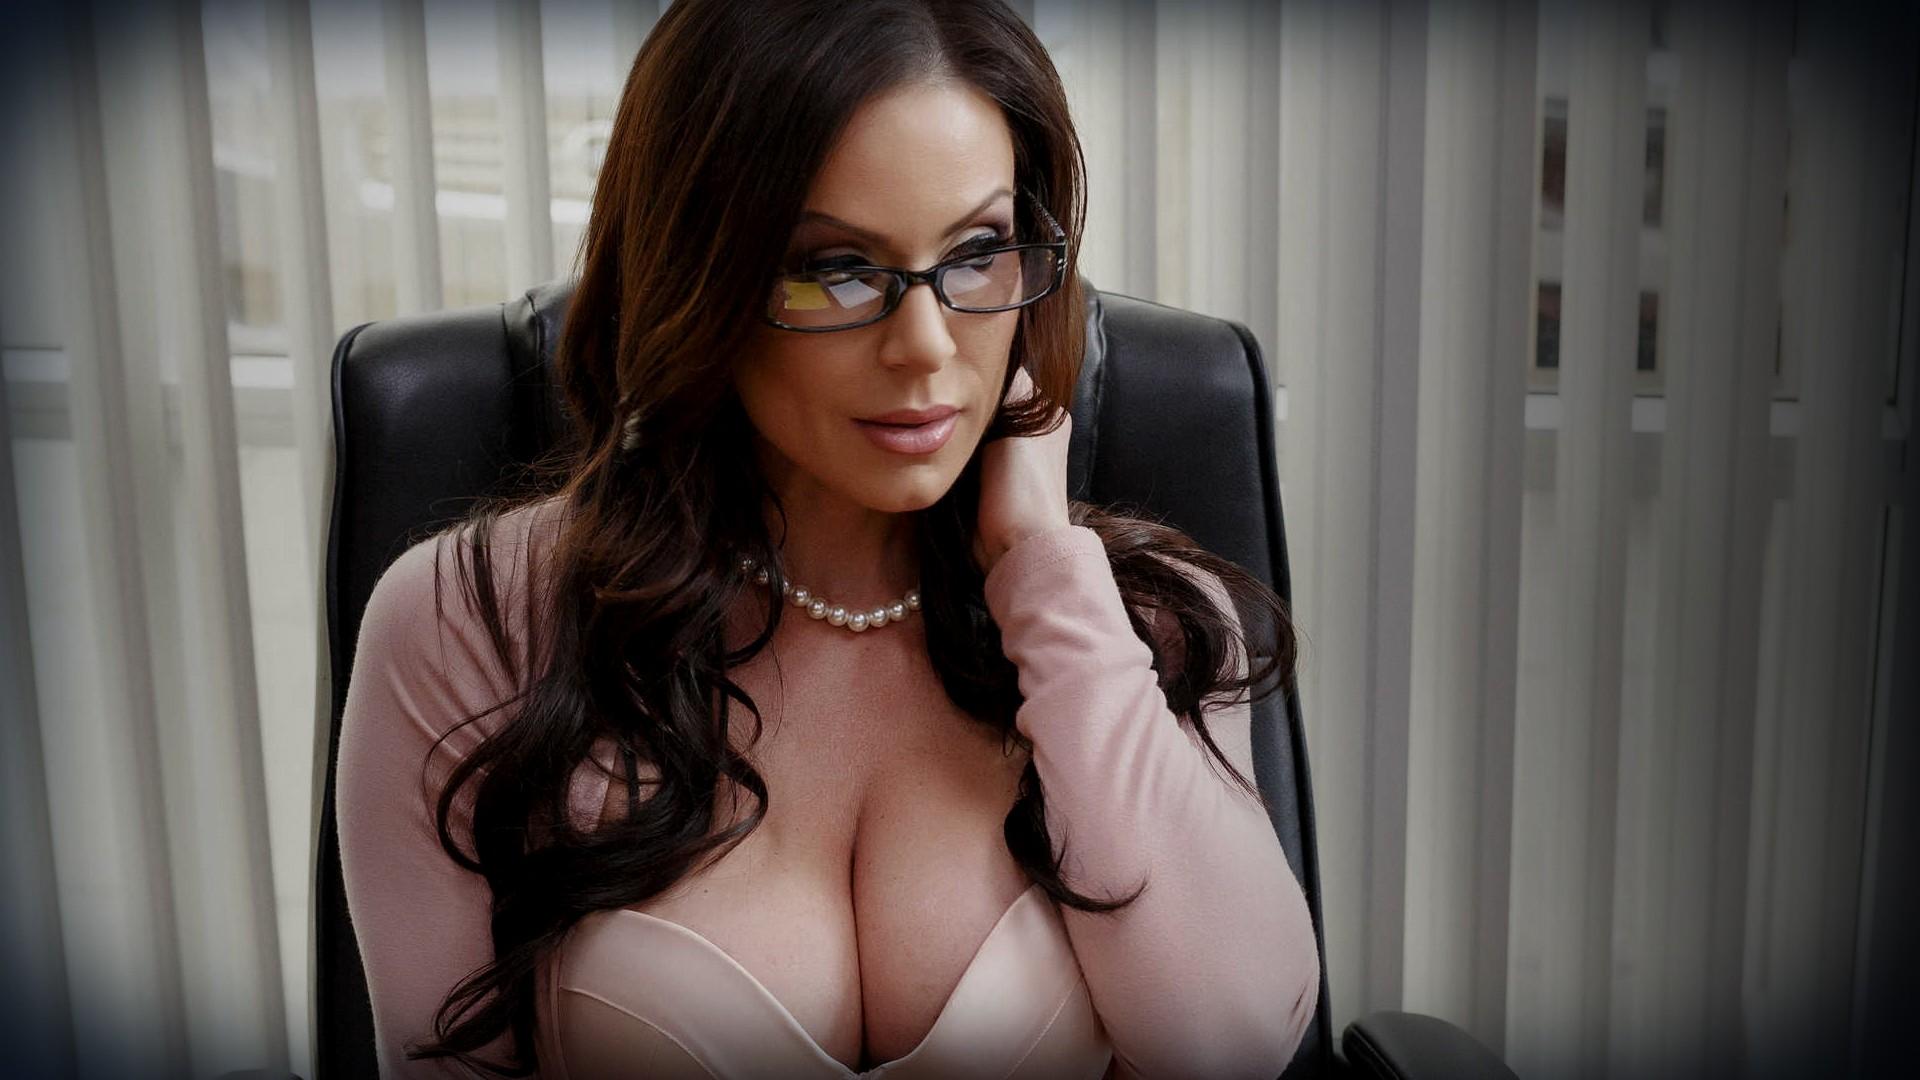 Pornstar Kendra Lust Glasses